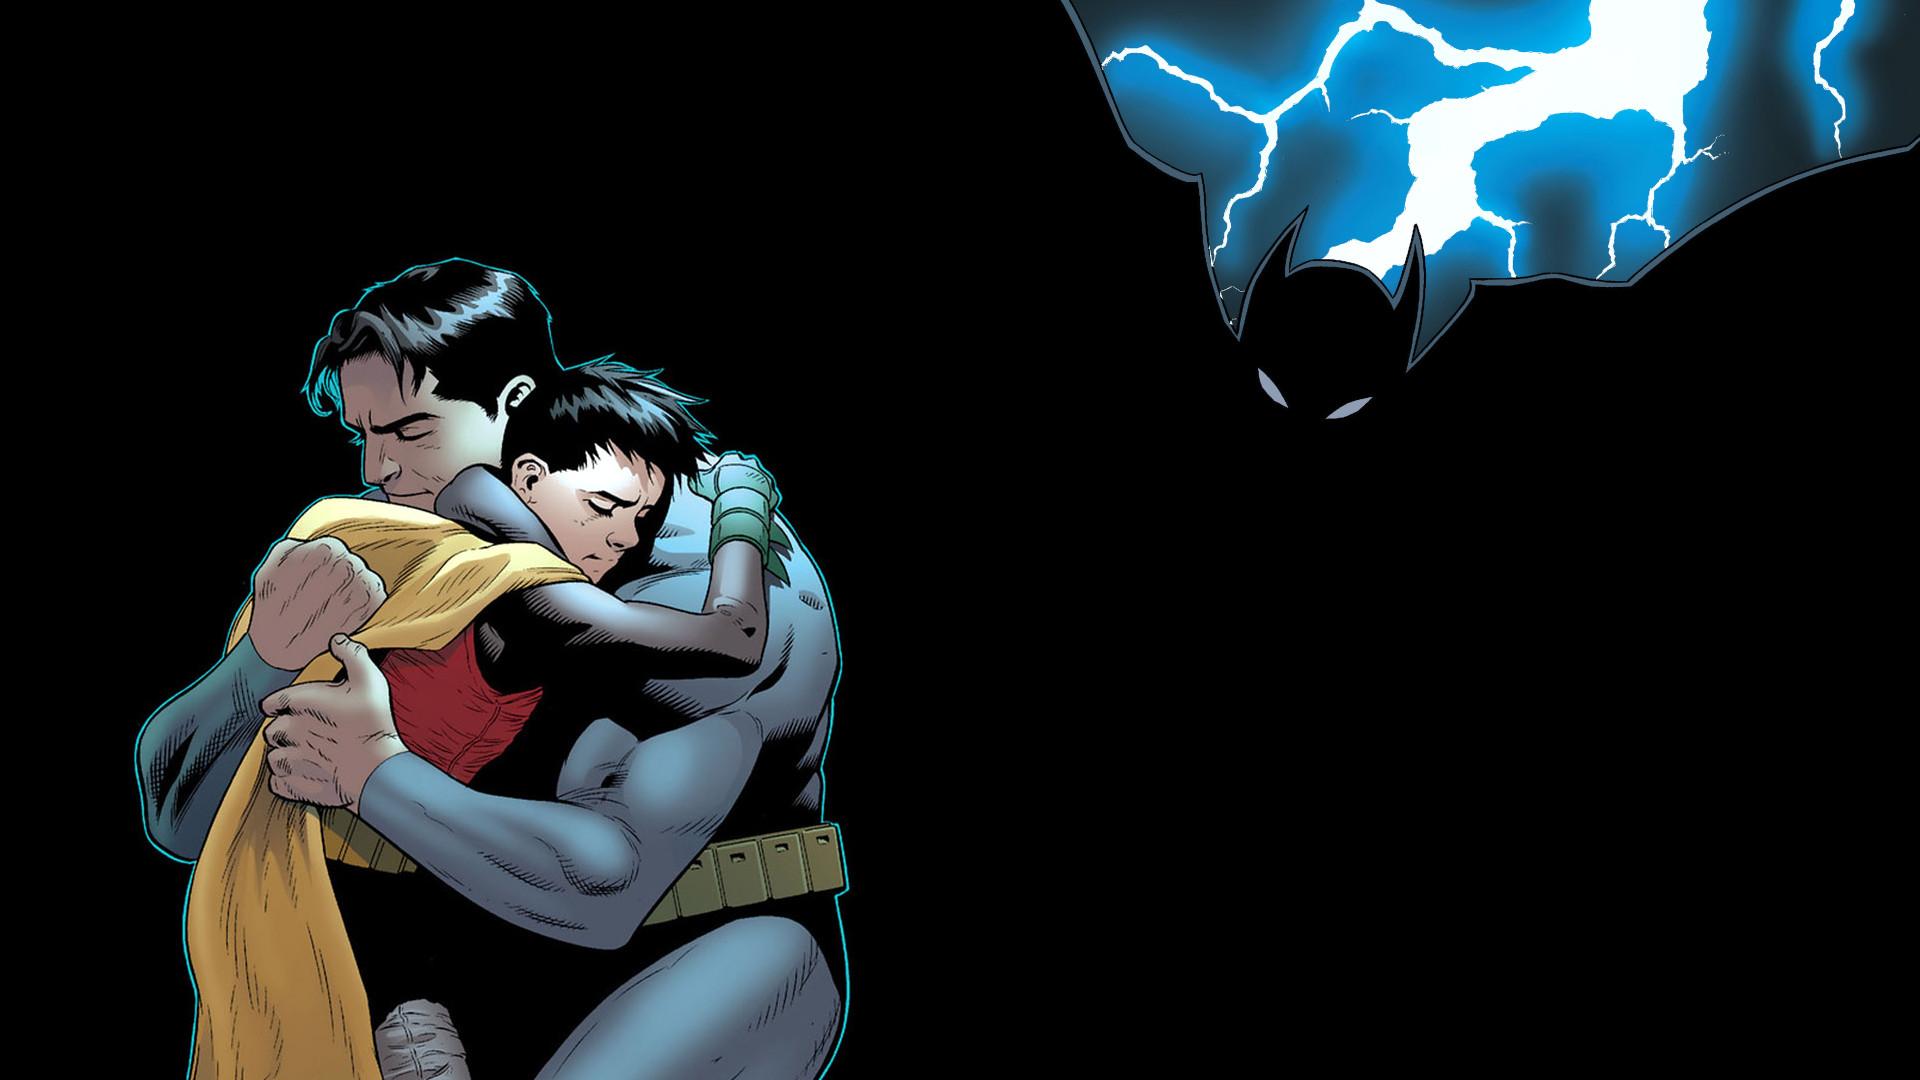 Batman Robin Hug Embrace Lightning Black DC-comics wallpaper .